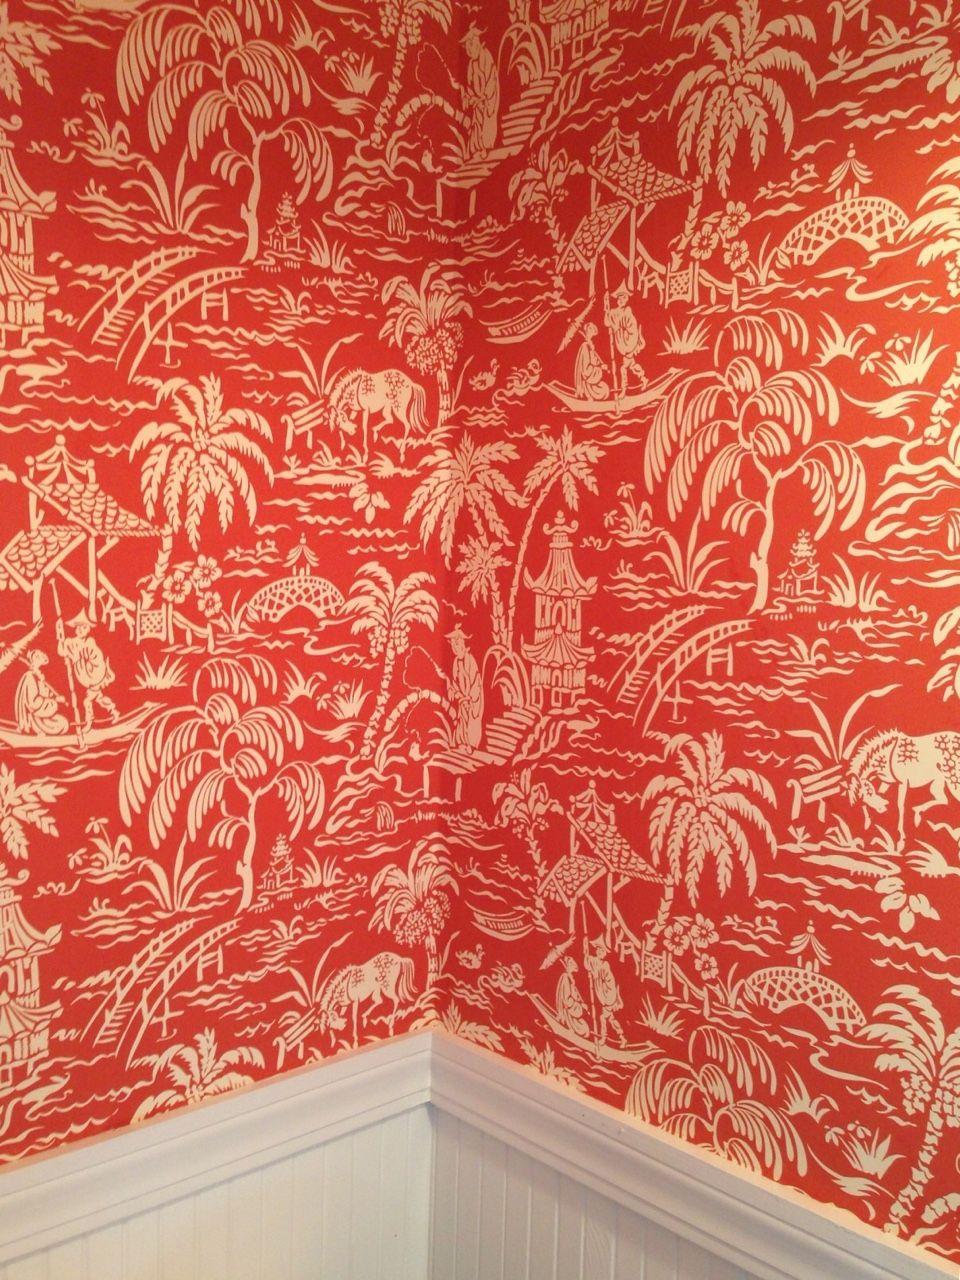 Chinoiserie Design By Piero Fornasetti Tapetit Pinterest - Piero fornasetti wallpaper designs